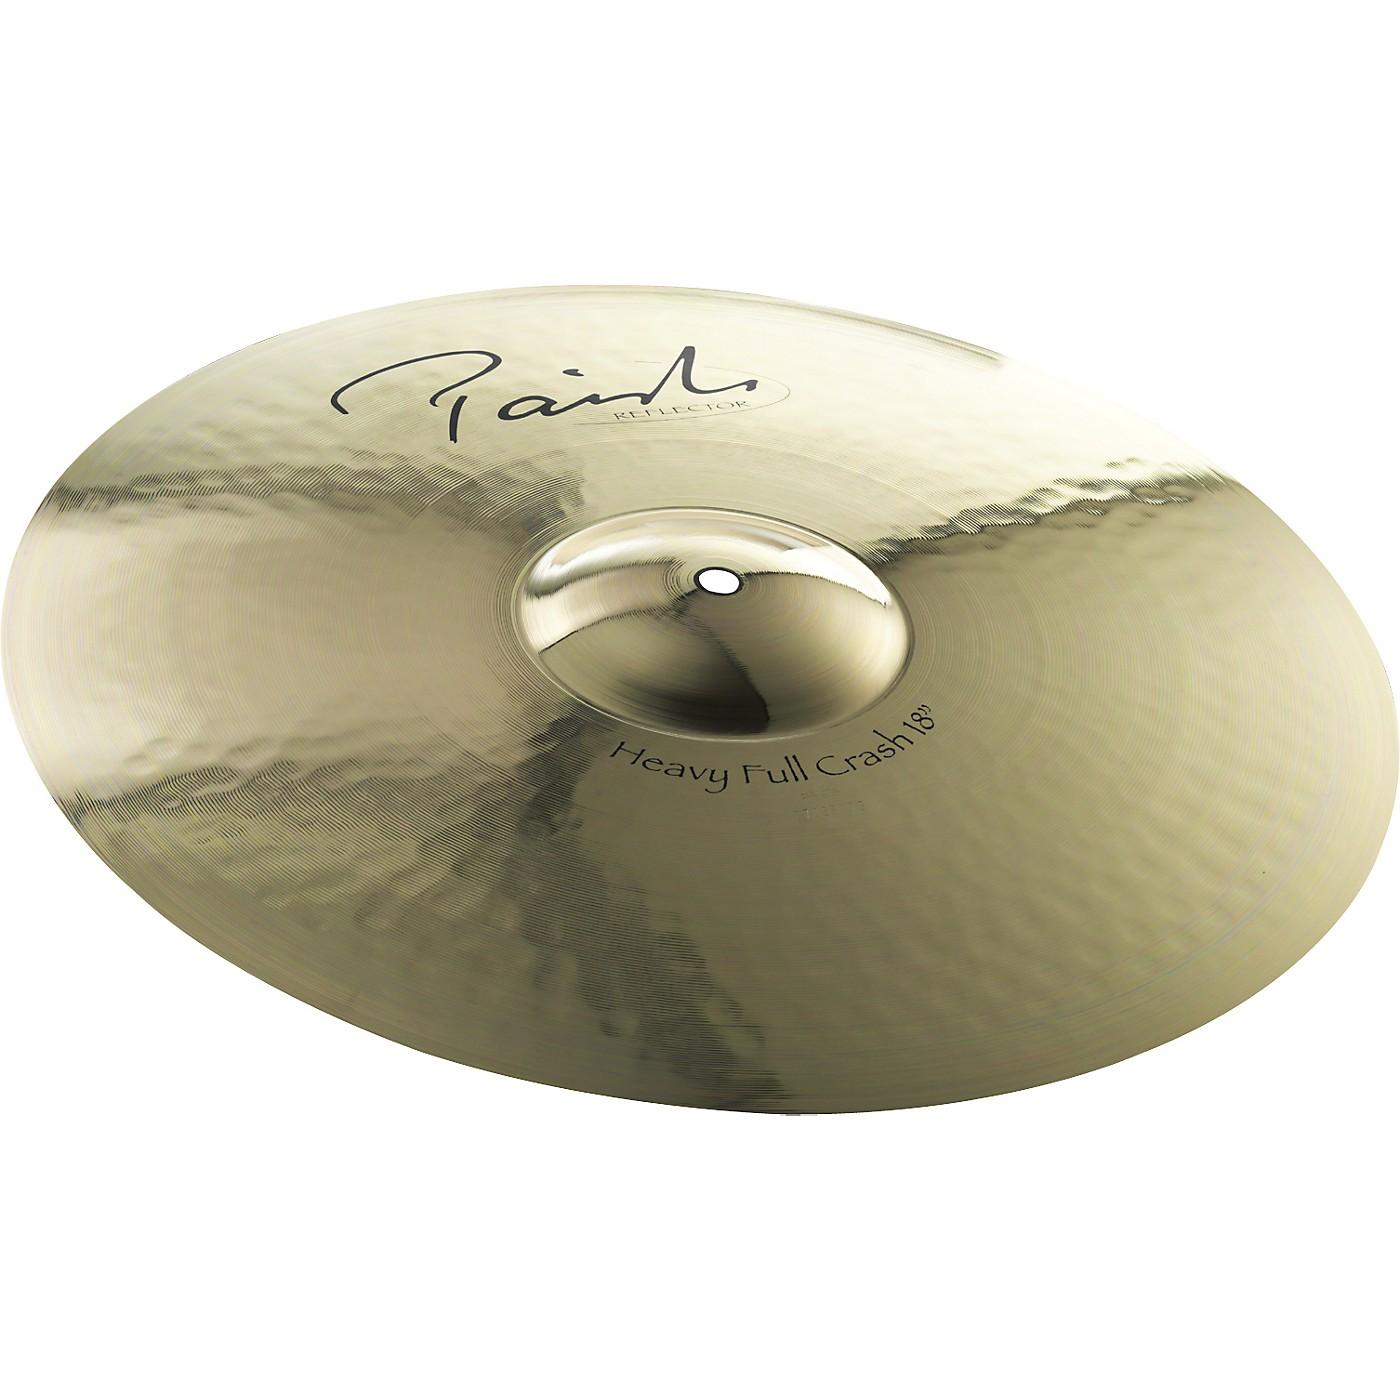 Paiste Signature Reflector Heavy Full Crash Cymbal thumbnail